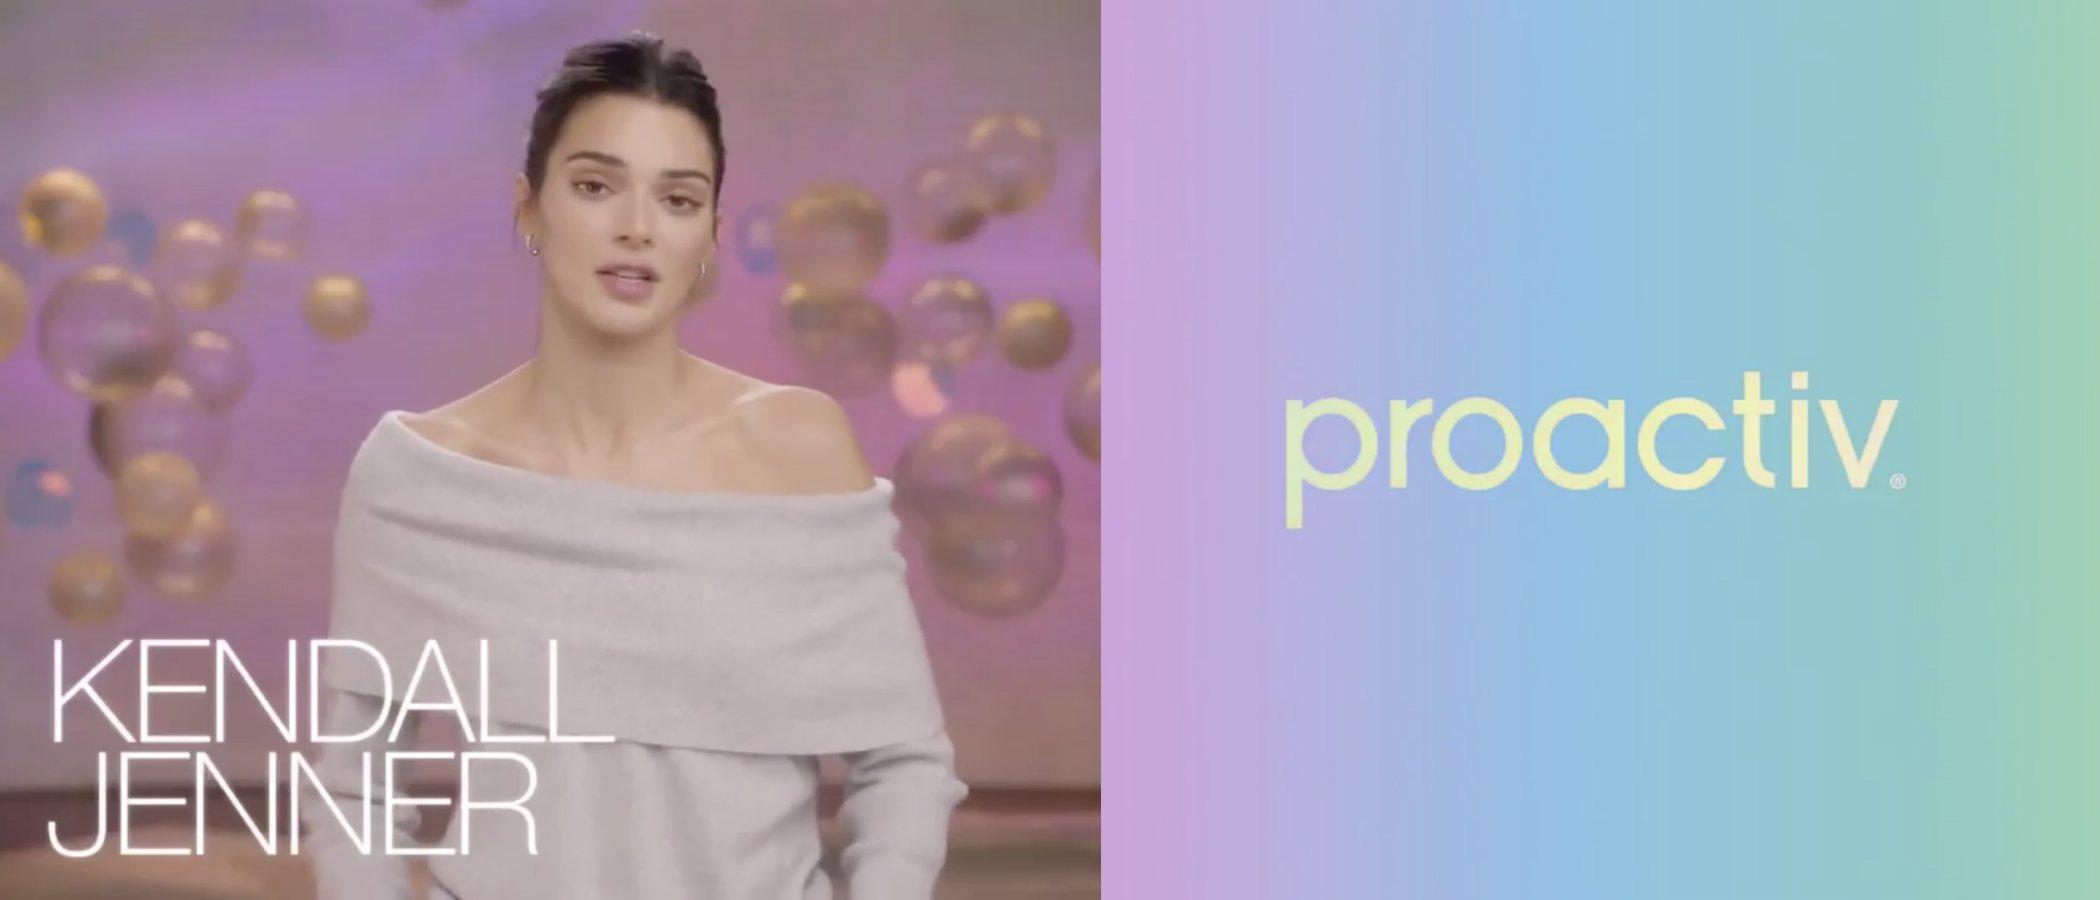 Kendall Jenner se estrena como rostro de Proactiv con una gran polémica